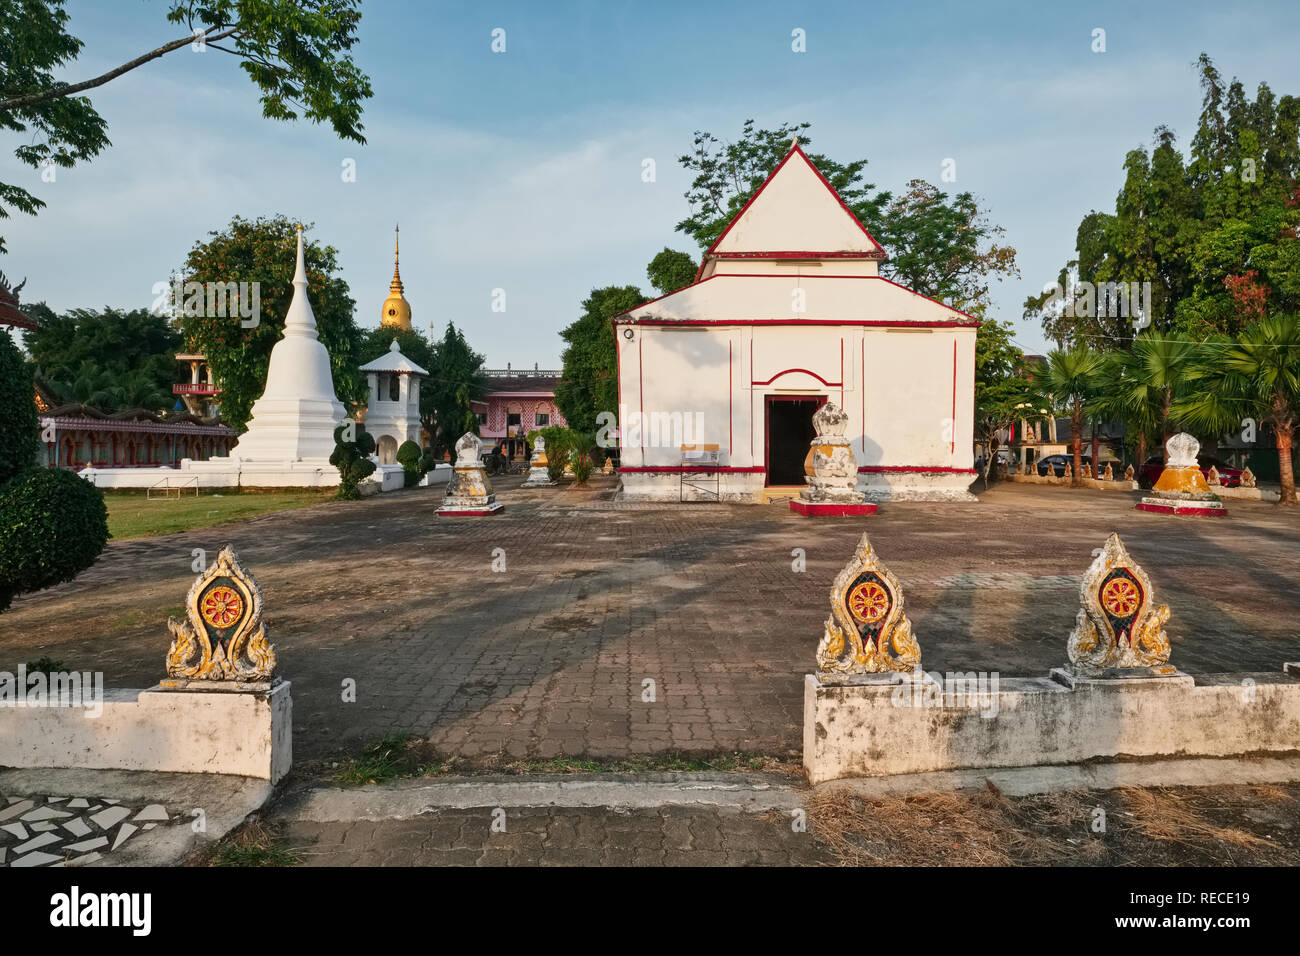 Il vecchio, storicamente imprtant Bot o Ubosot (ordinazione hall; destra) di Wat Phra Nang Sang, Thalang, Phuket, Tailandia; anteriore: Sema o pietre di confine Foto Stock